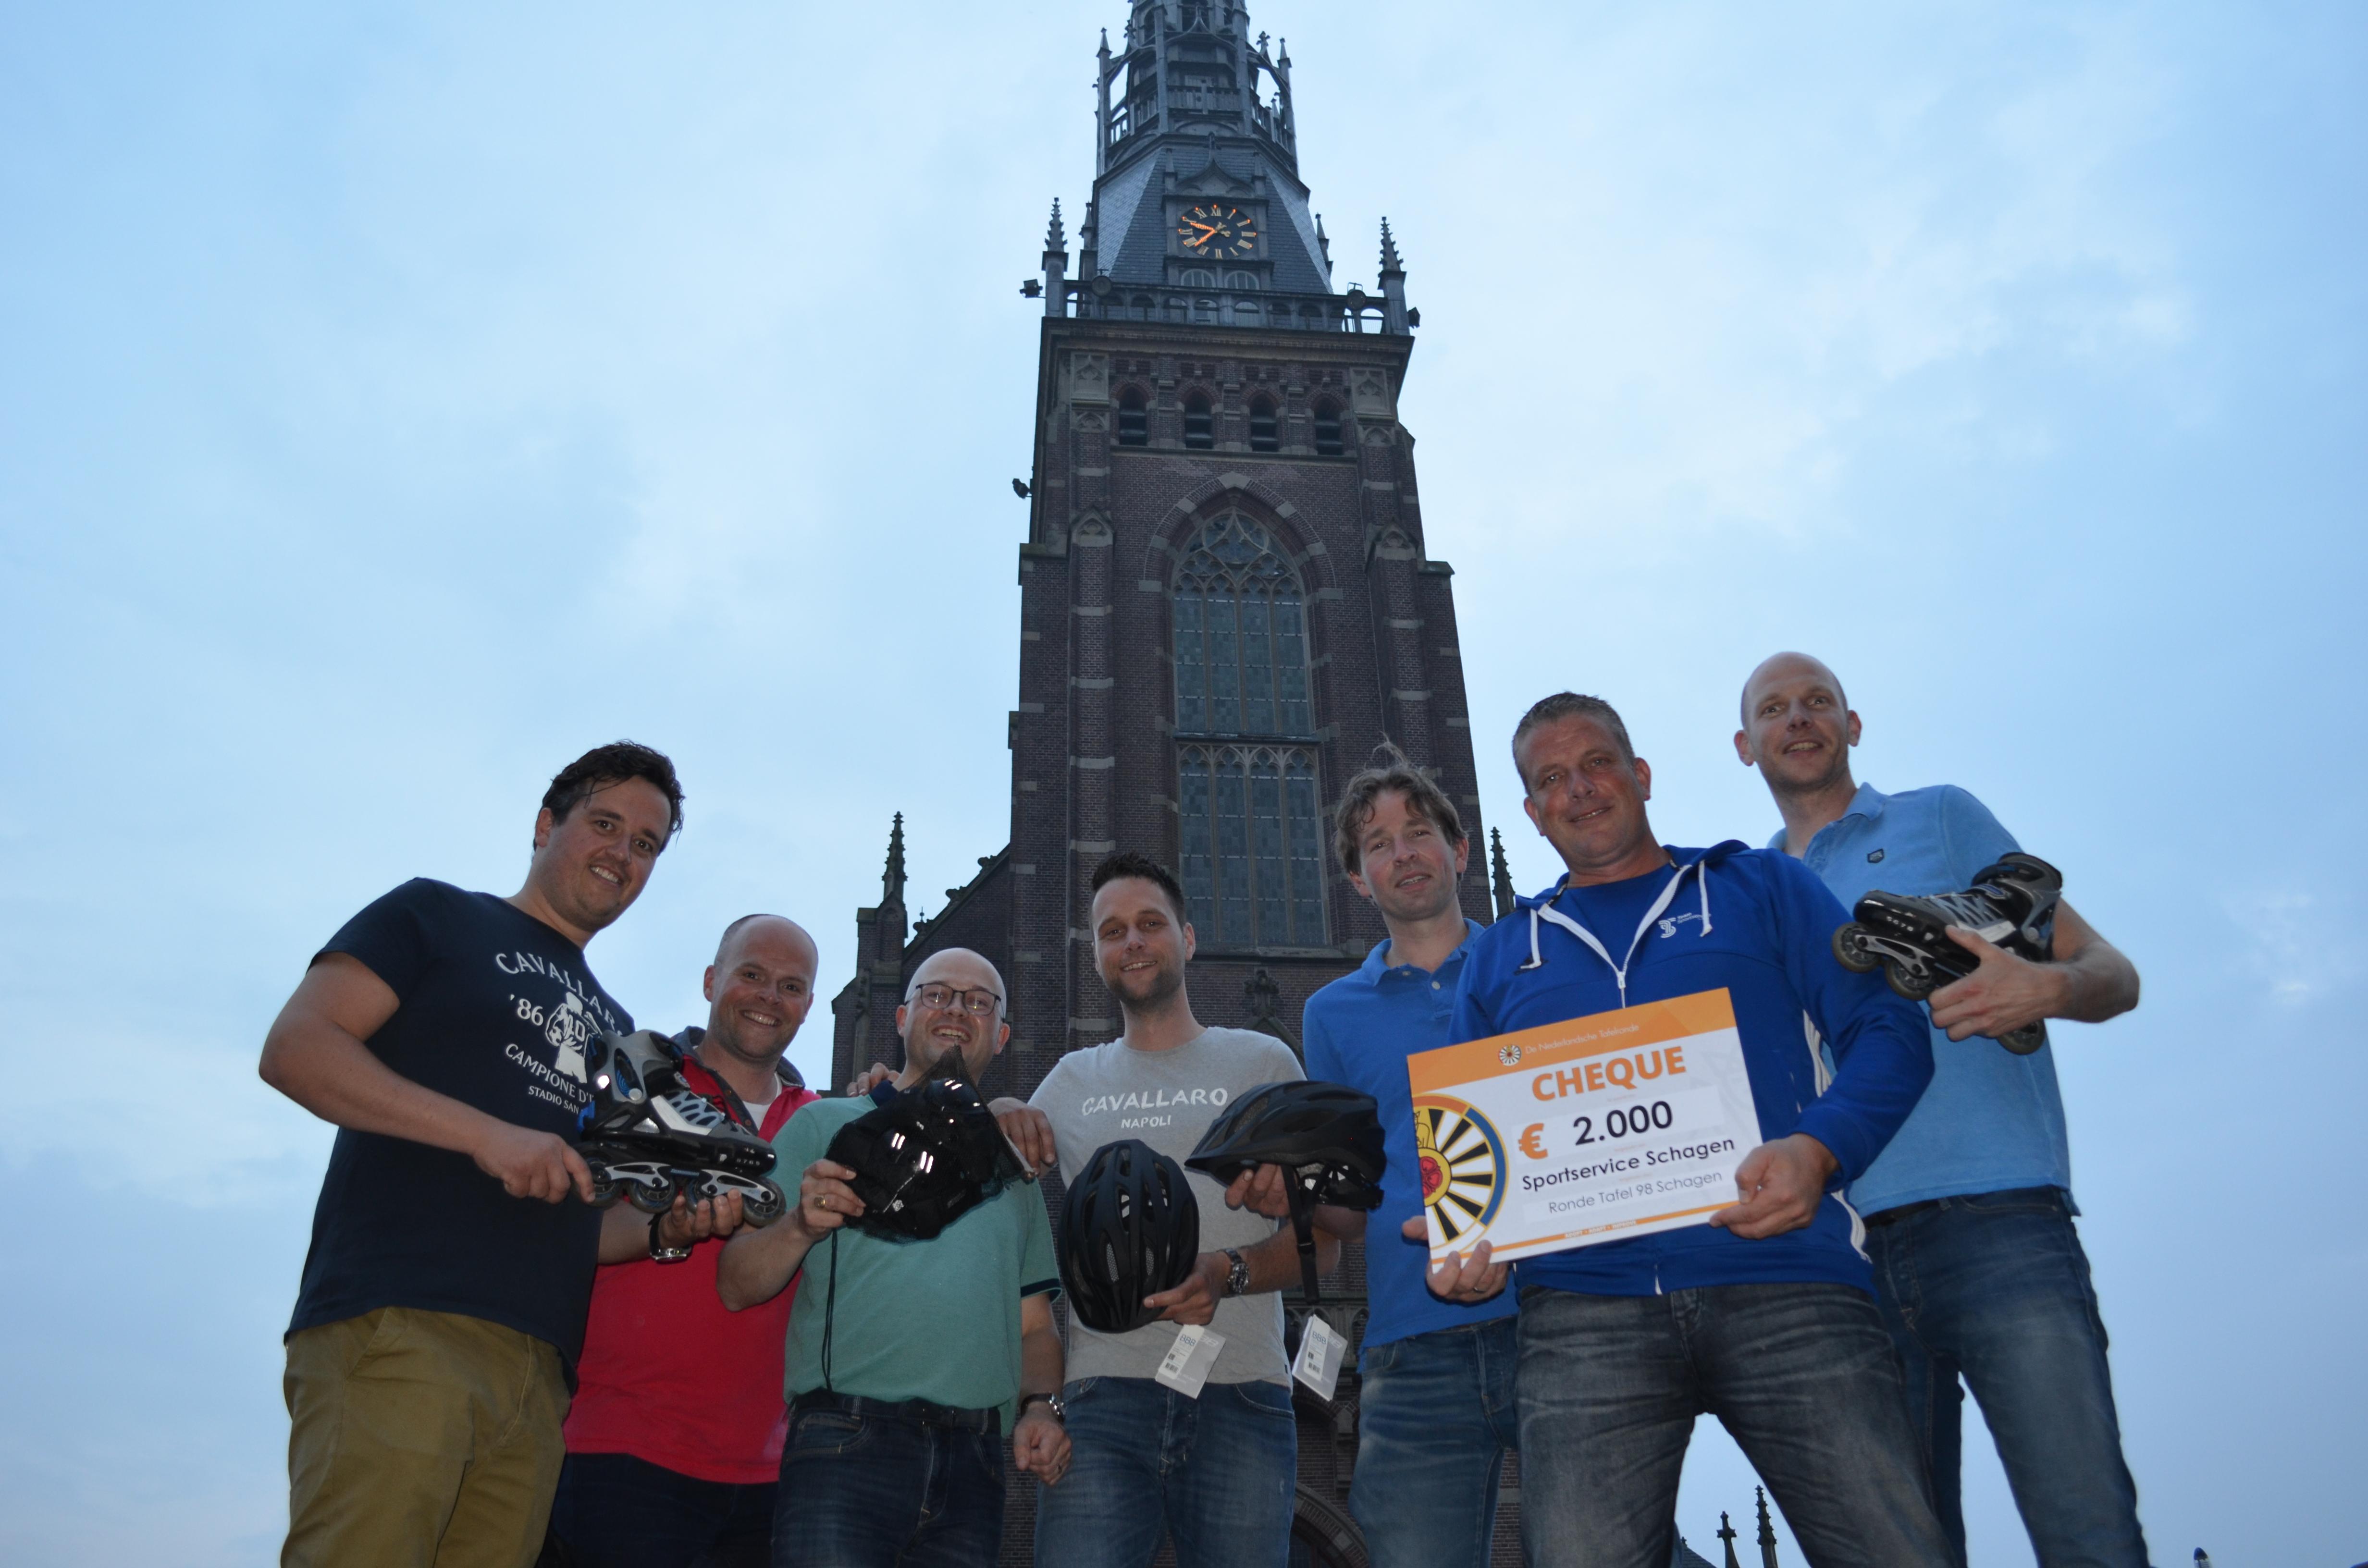 De Ronde Tafel doneert tweeduizend euro aan Team Sportservice Schagen. (Foto: Team Sportservice Schagen)